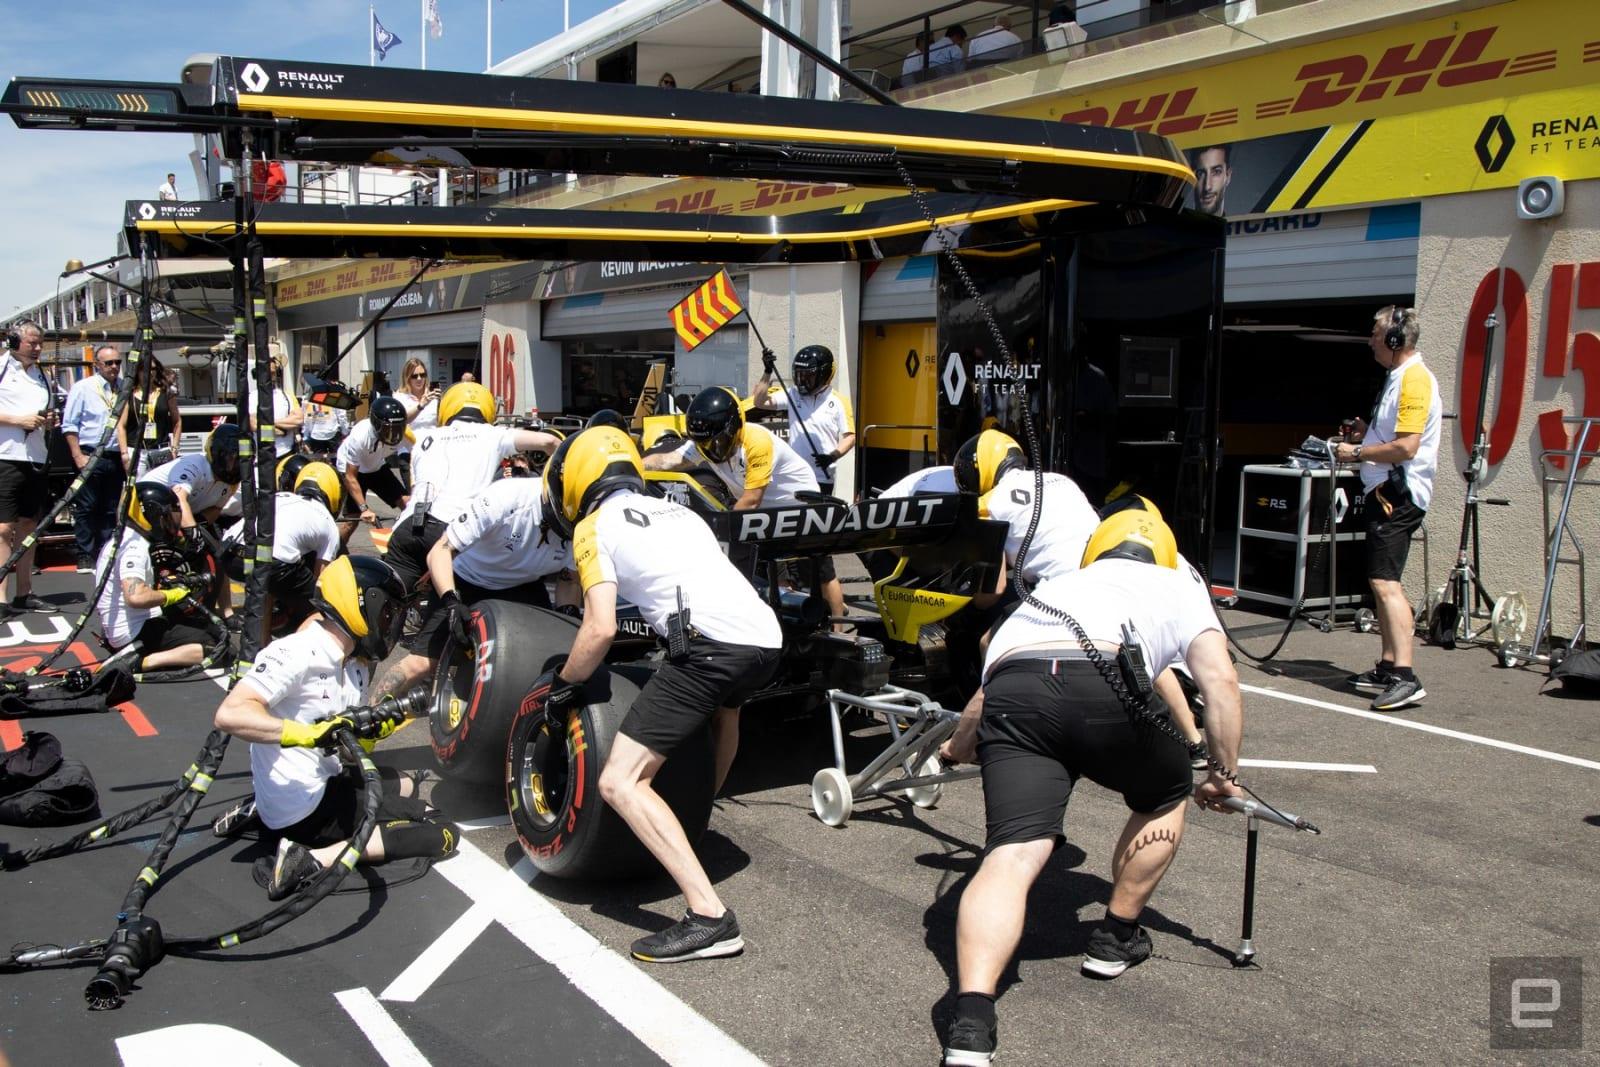 Renault 2021 season